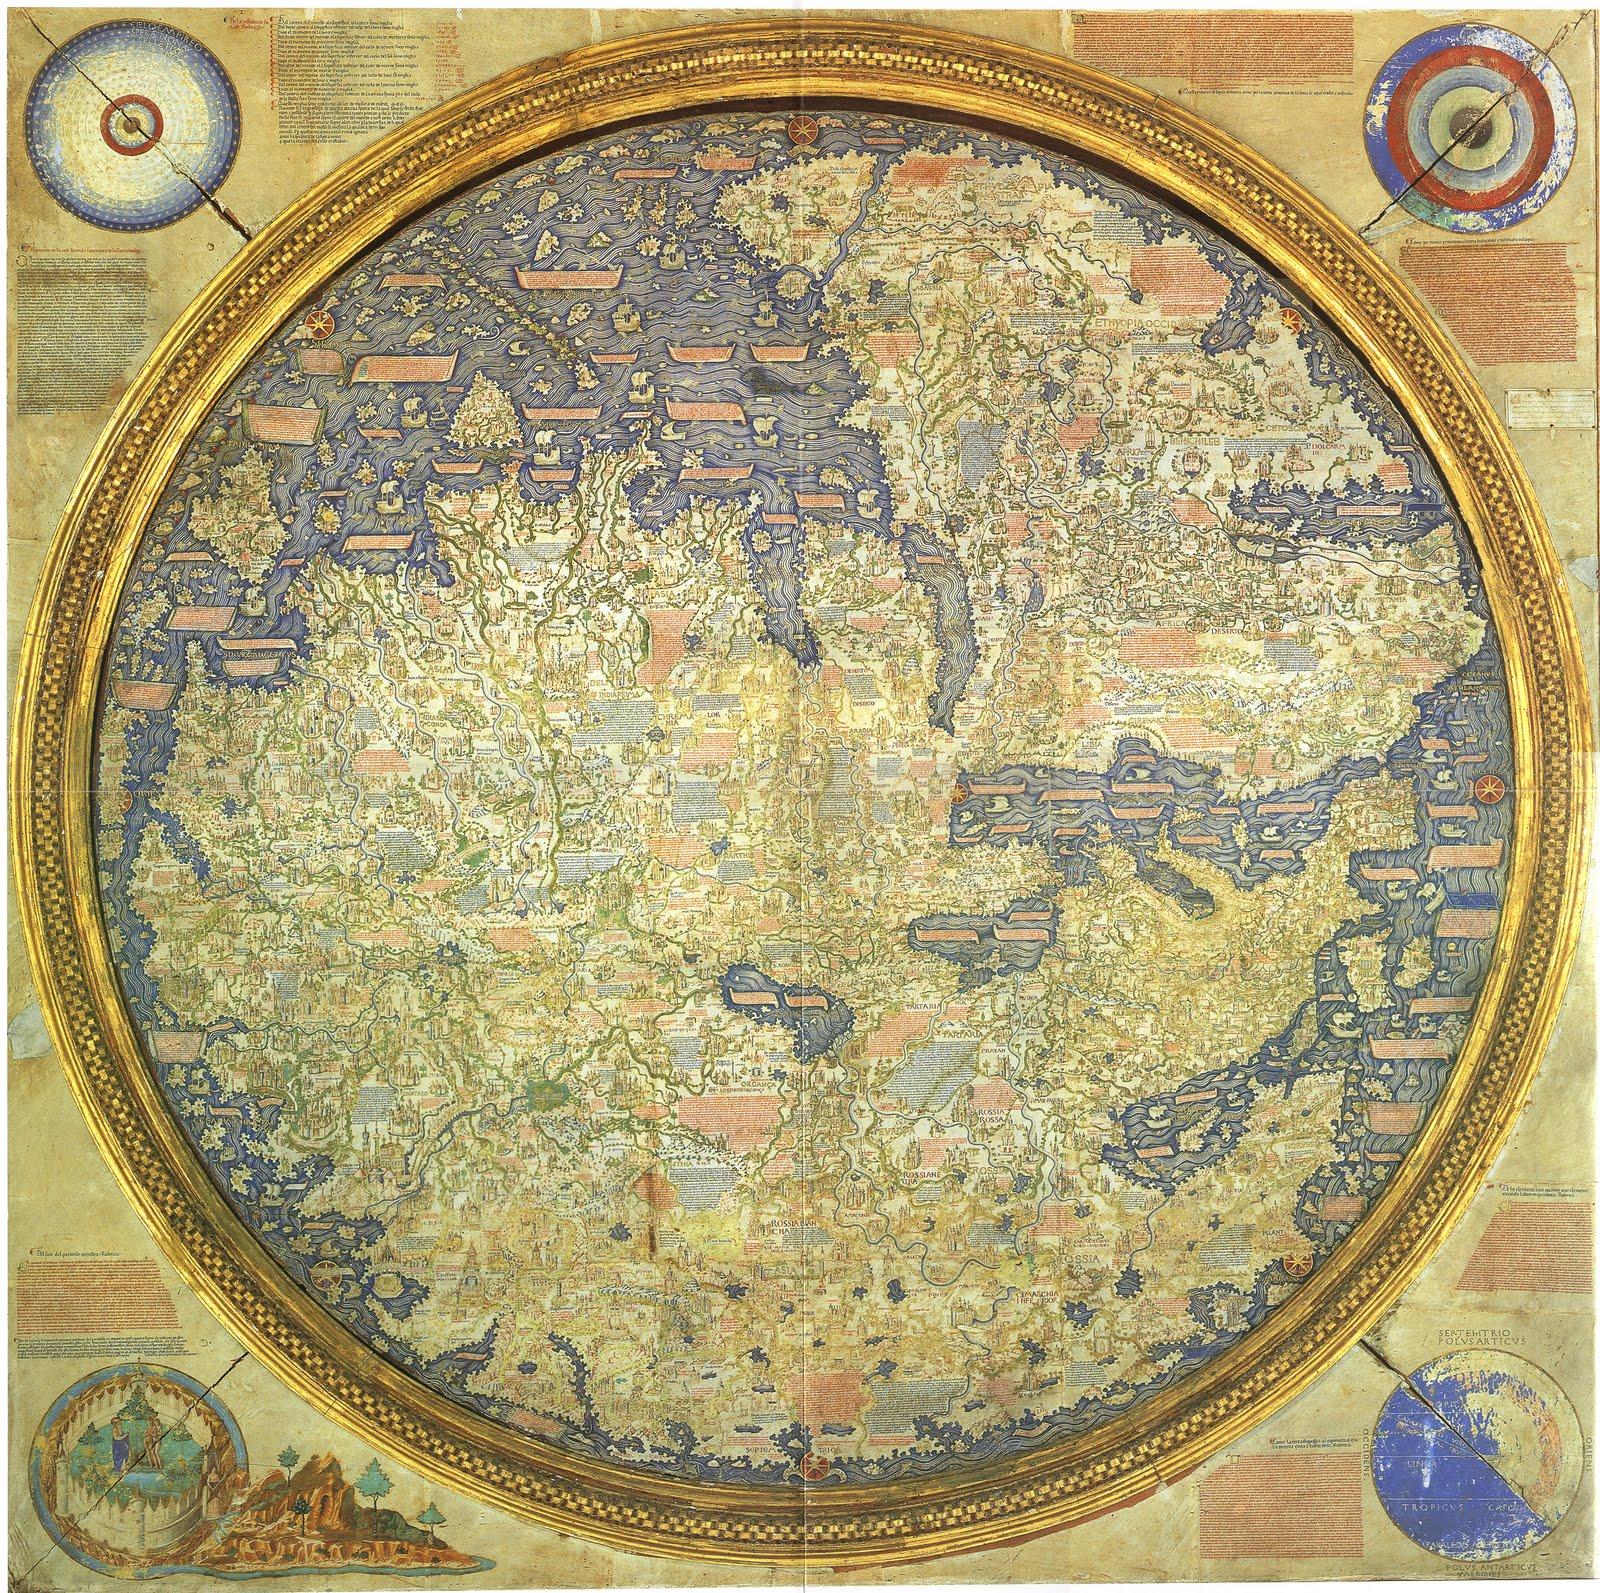 Ymago mundi Mapamundi de Fra Mauro alta definio